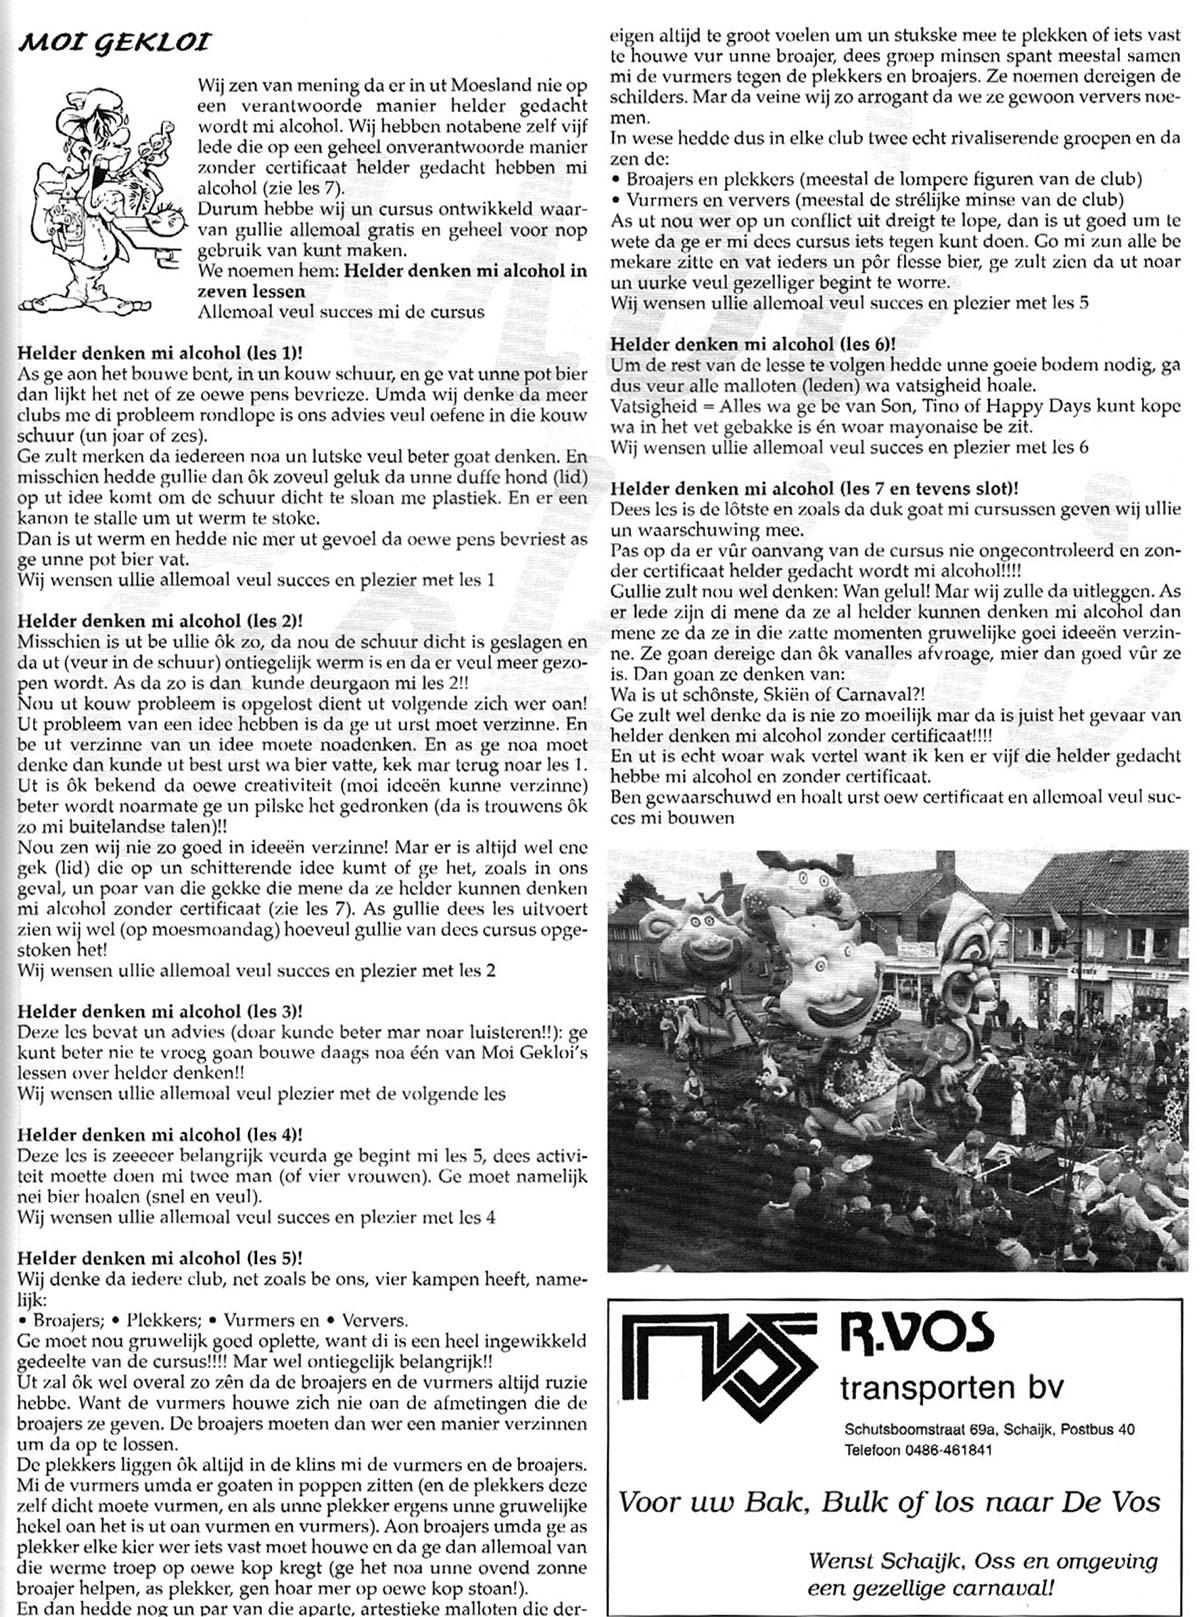 Stukje uit de carnavalskrant van Moi Gekloi - 1998